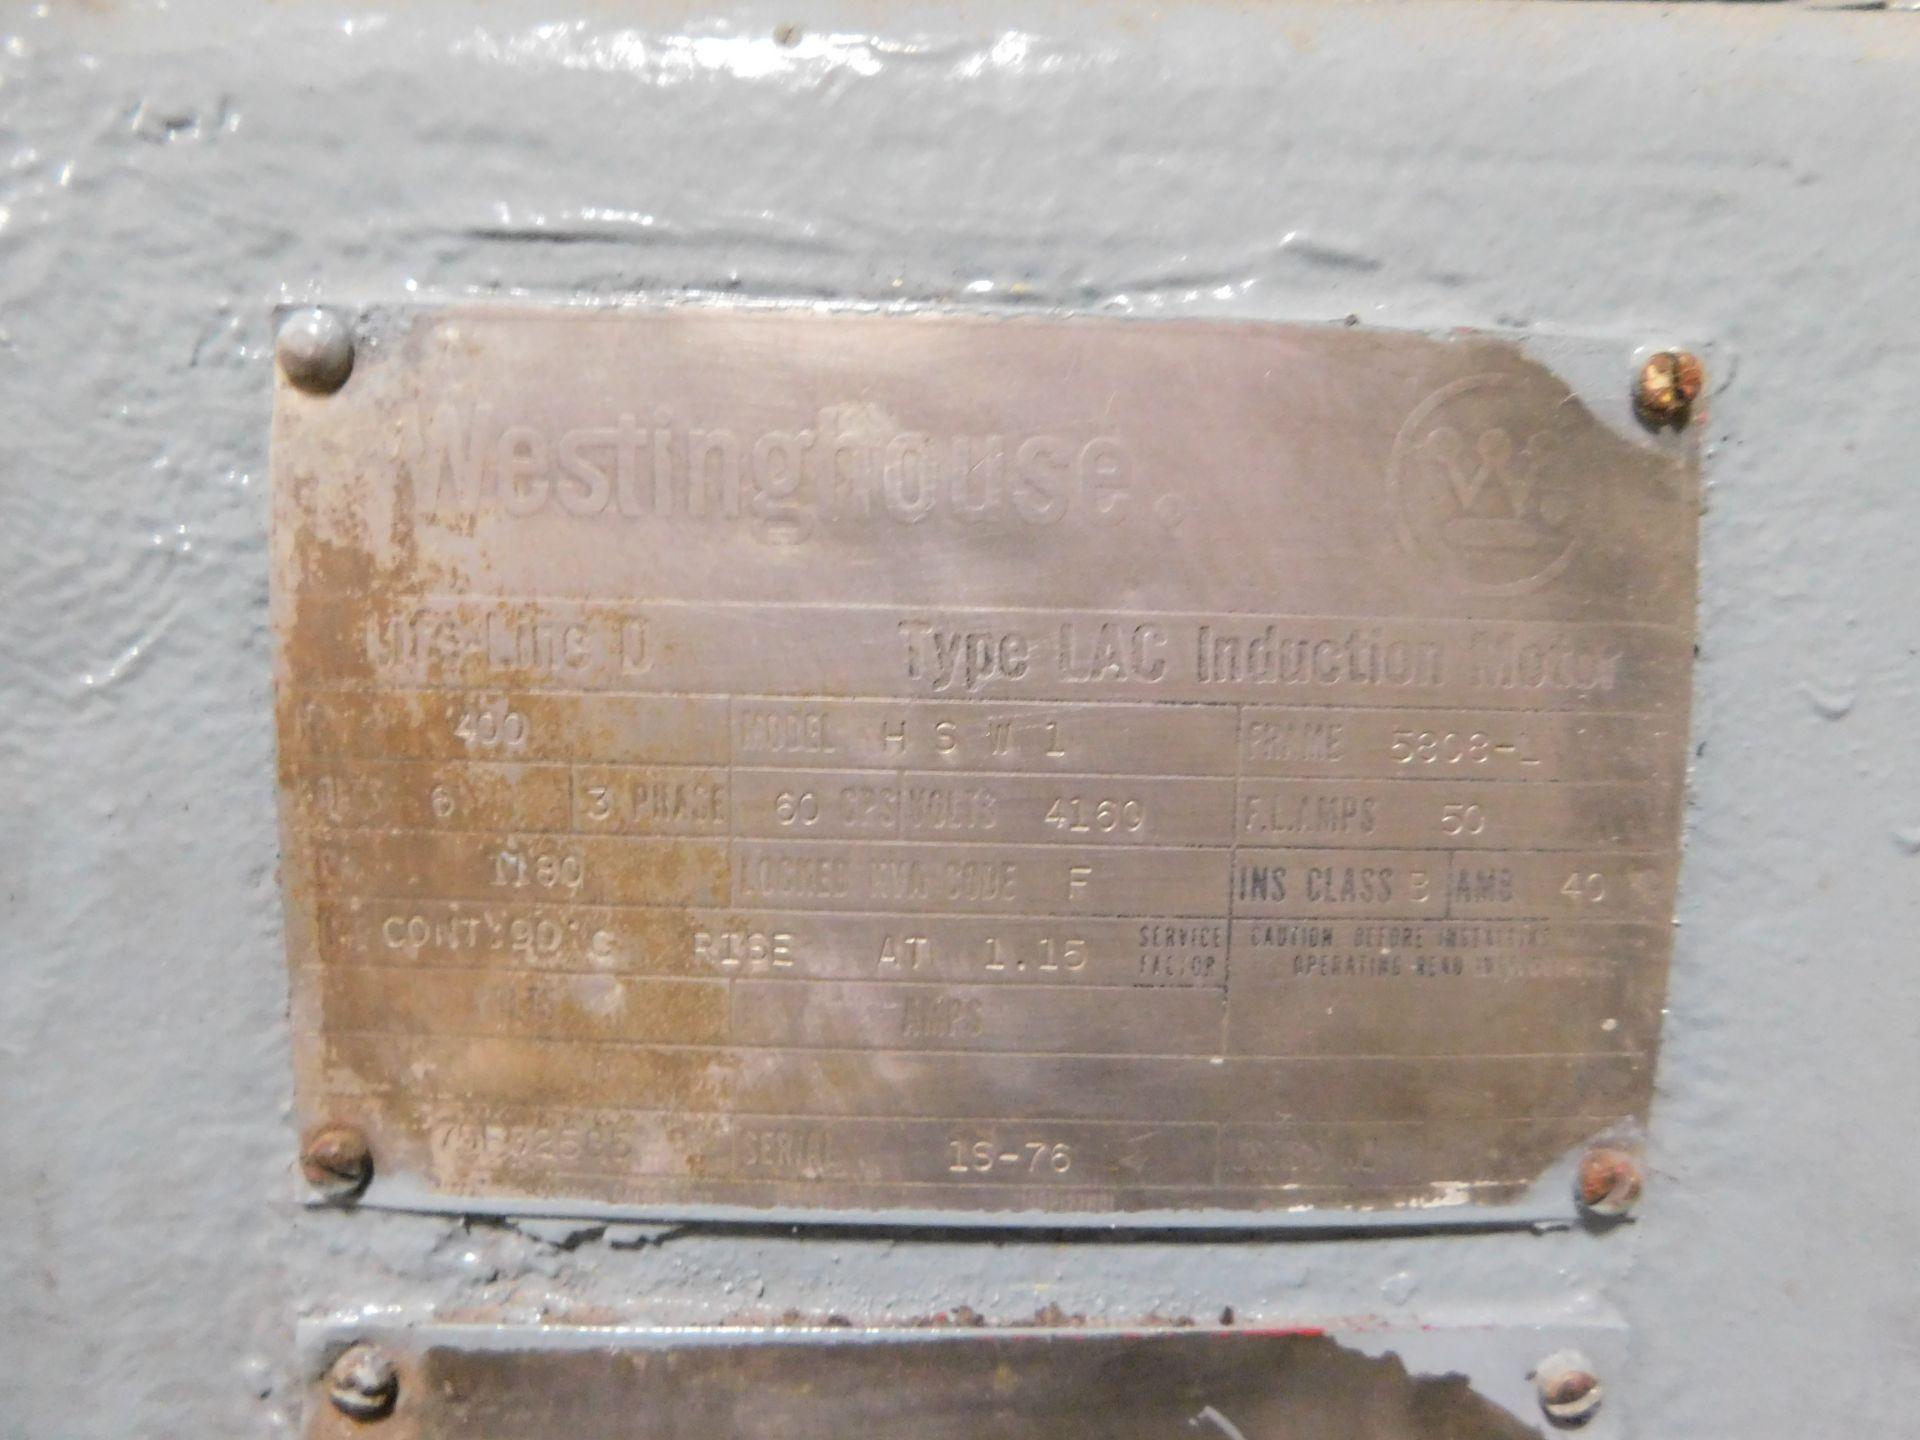 Teco Westinghouse Motor. 400 HP. 3 Ph. 1180 RPM. 4000 V. 60 Hz. 5808L. HSW1. - Image 6 of 6